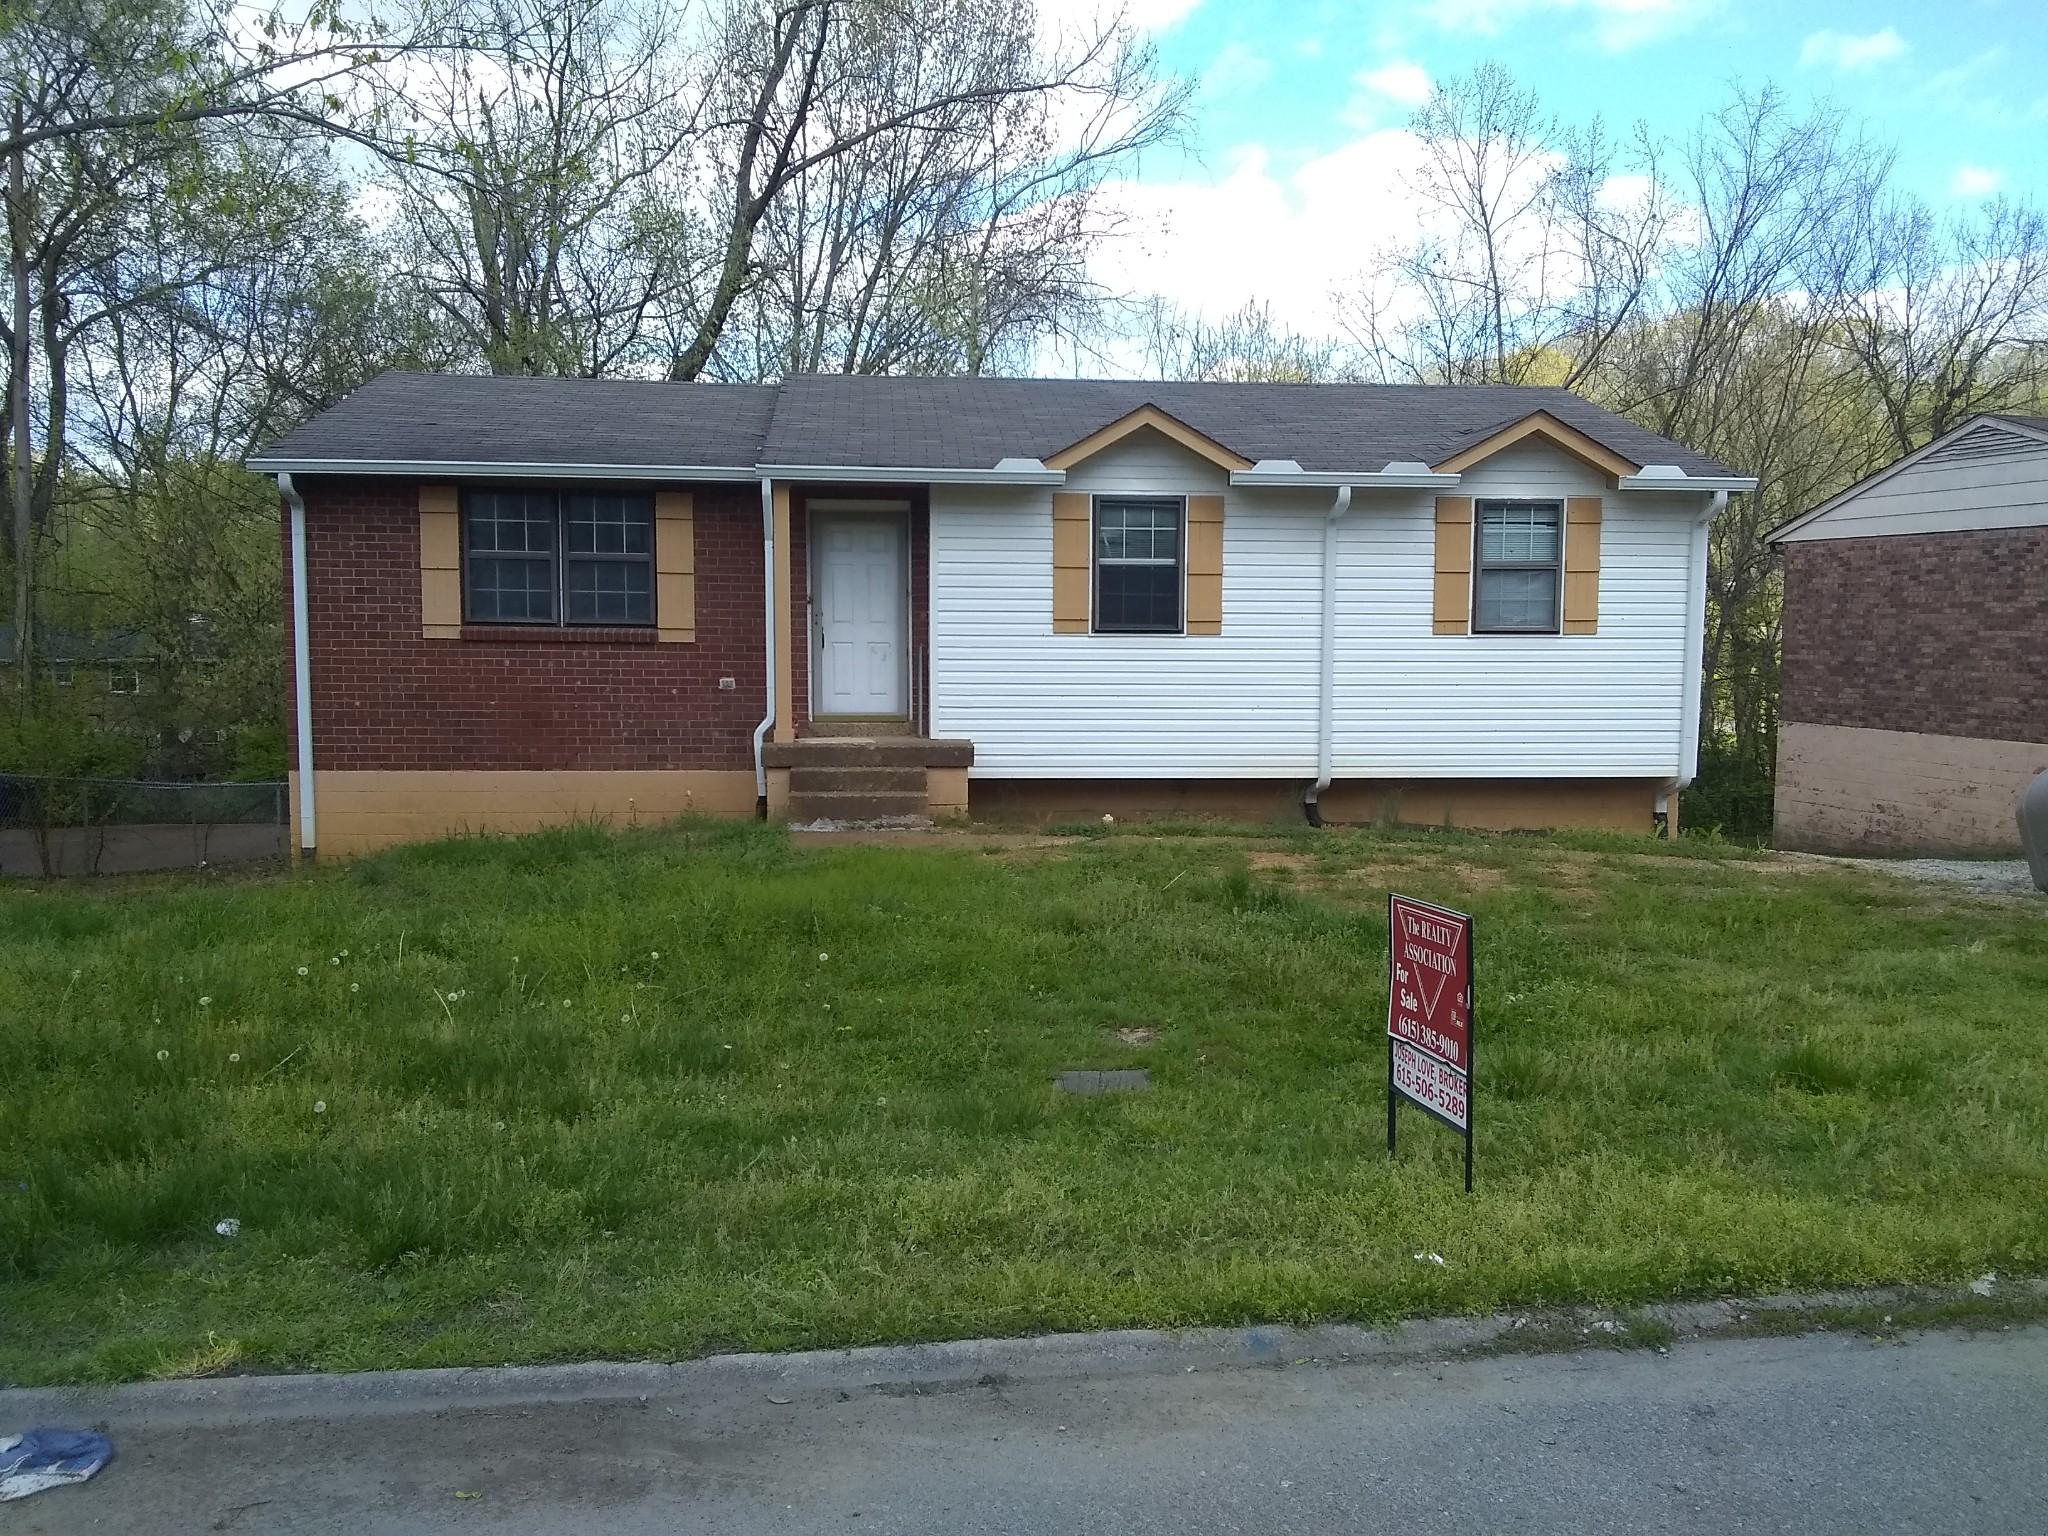 4819 Apollo Dr, Nashville-Antioch in Davidson County, TN County, TN 37013 Home for Sale